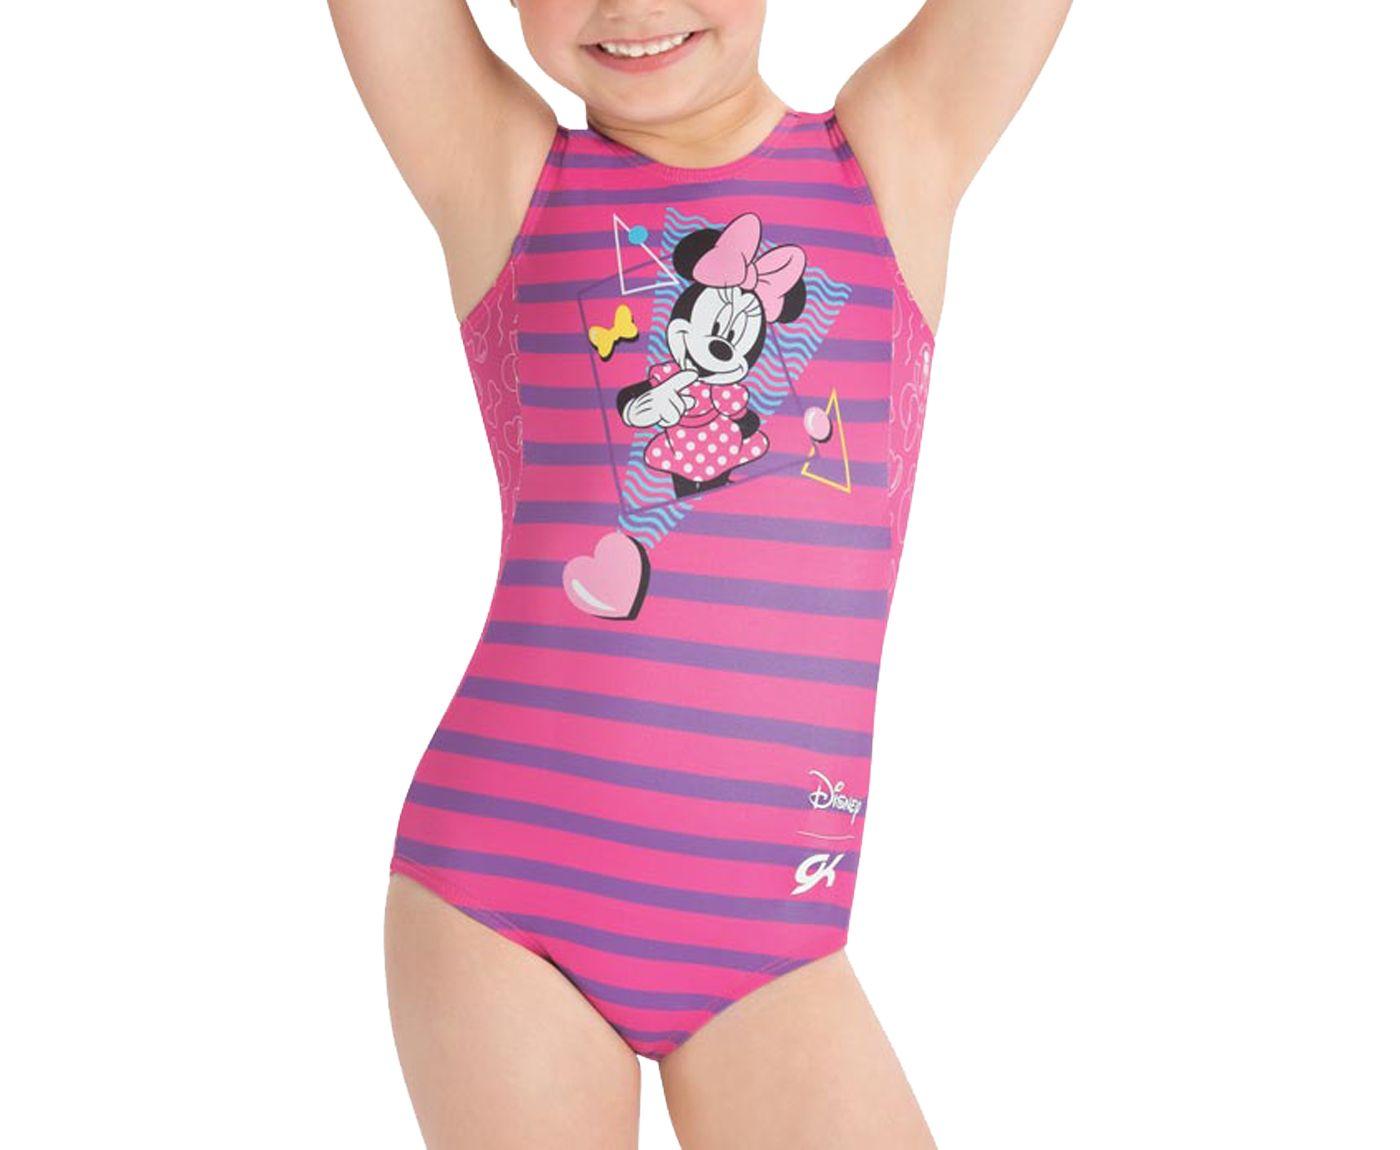 GK Elite Toddler Disney Minnie Mouse Retro Gymnastics Leotard